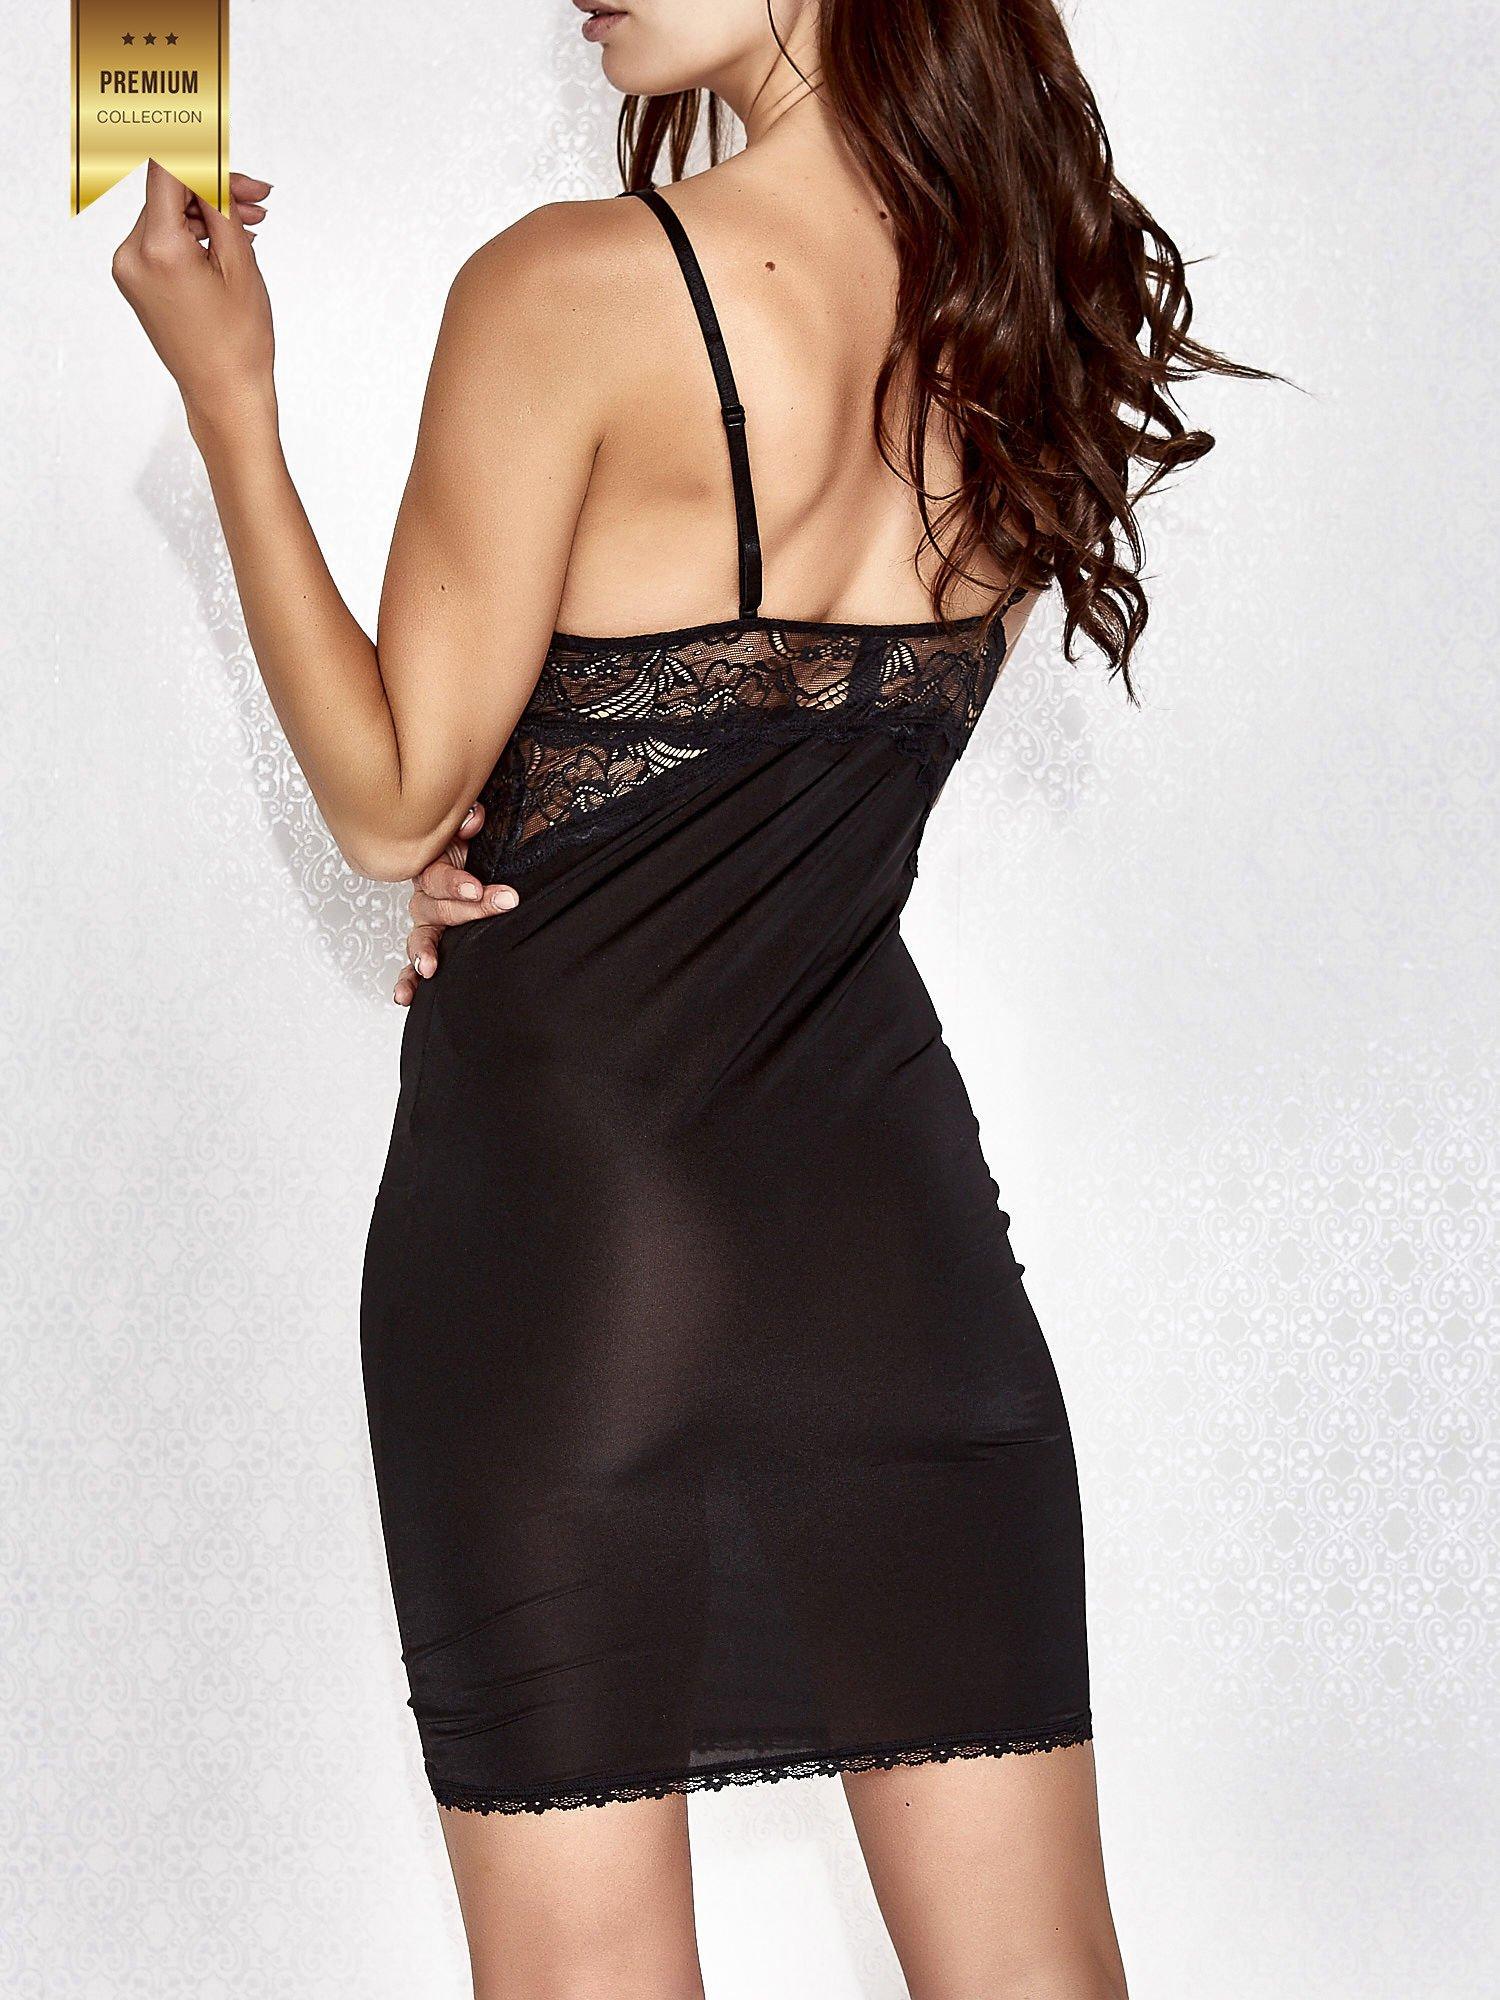 Czarna koronkowa koszula nocna damska                                  zdj.                                  2